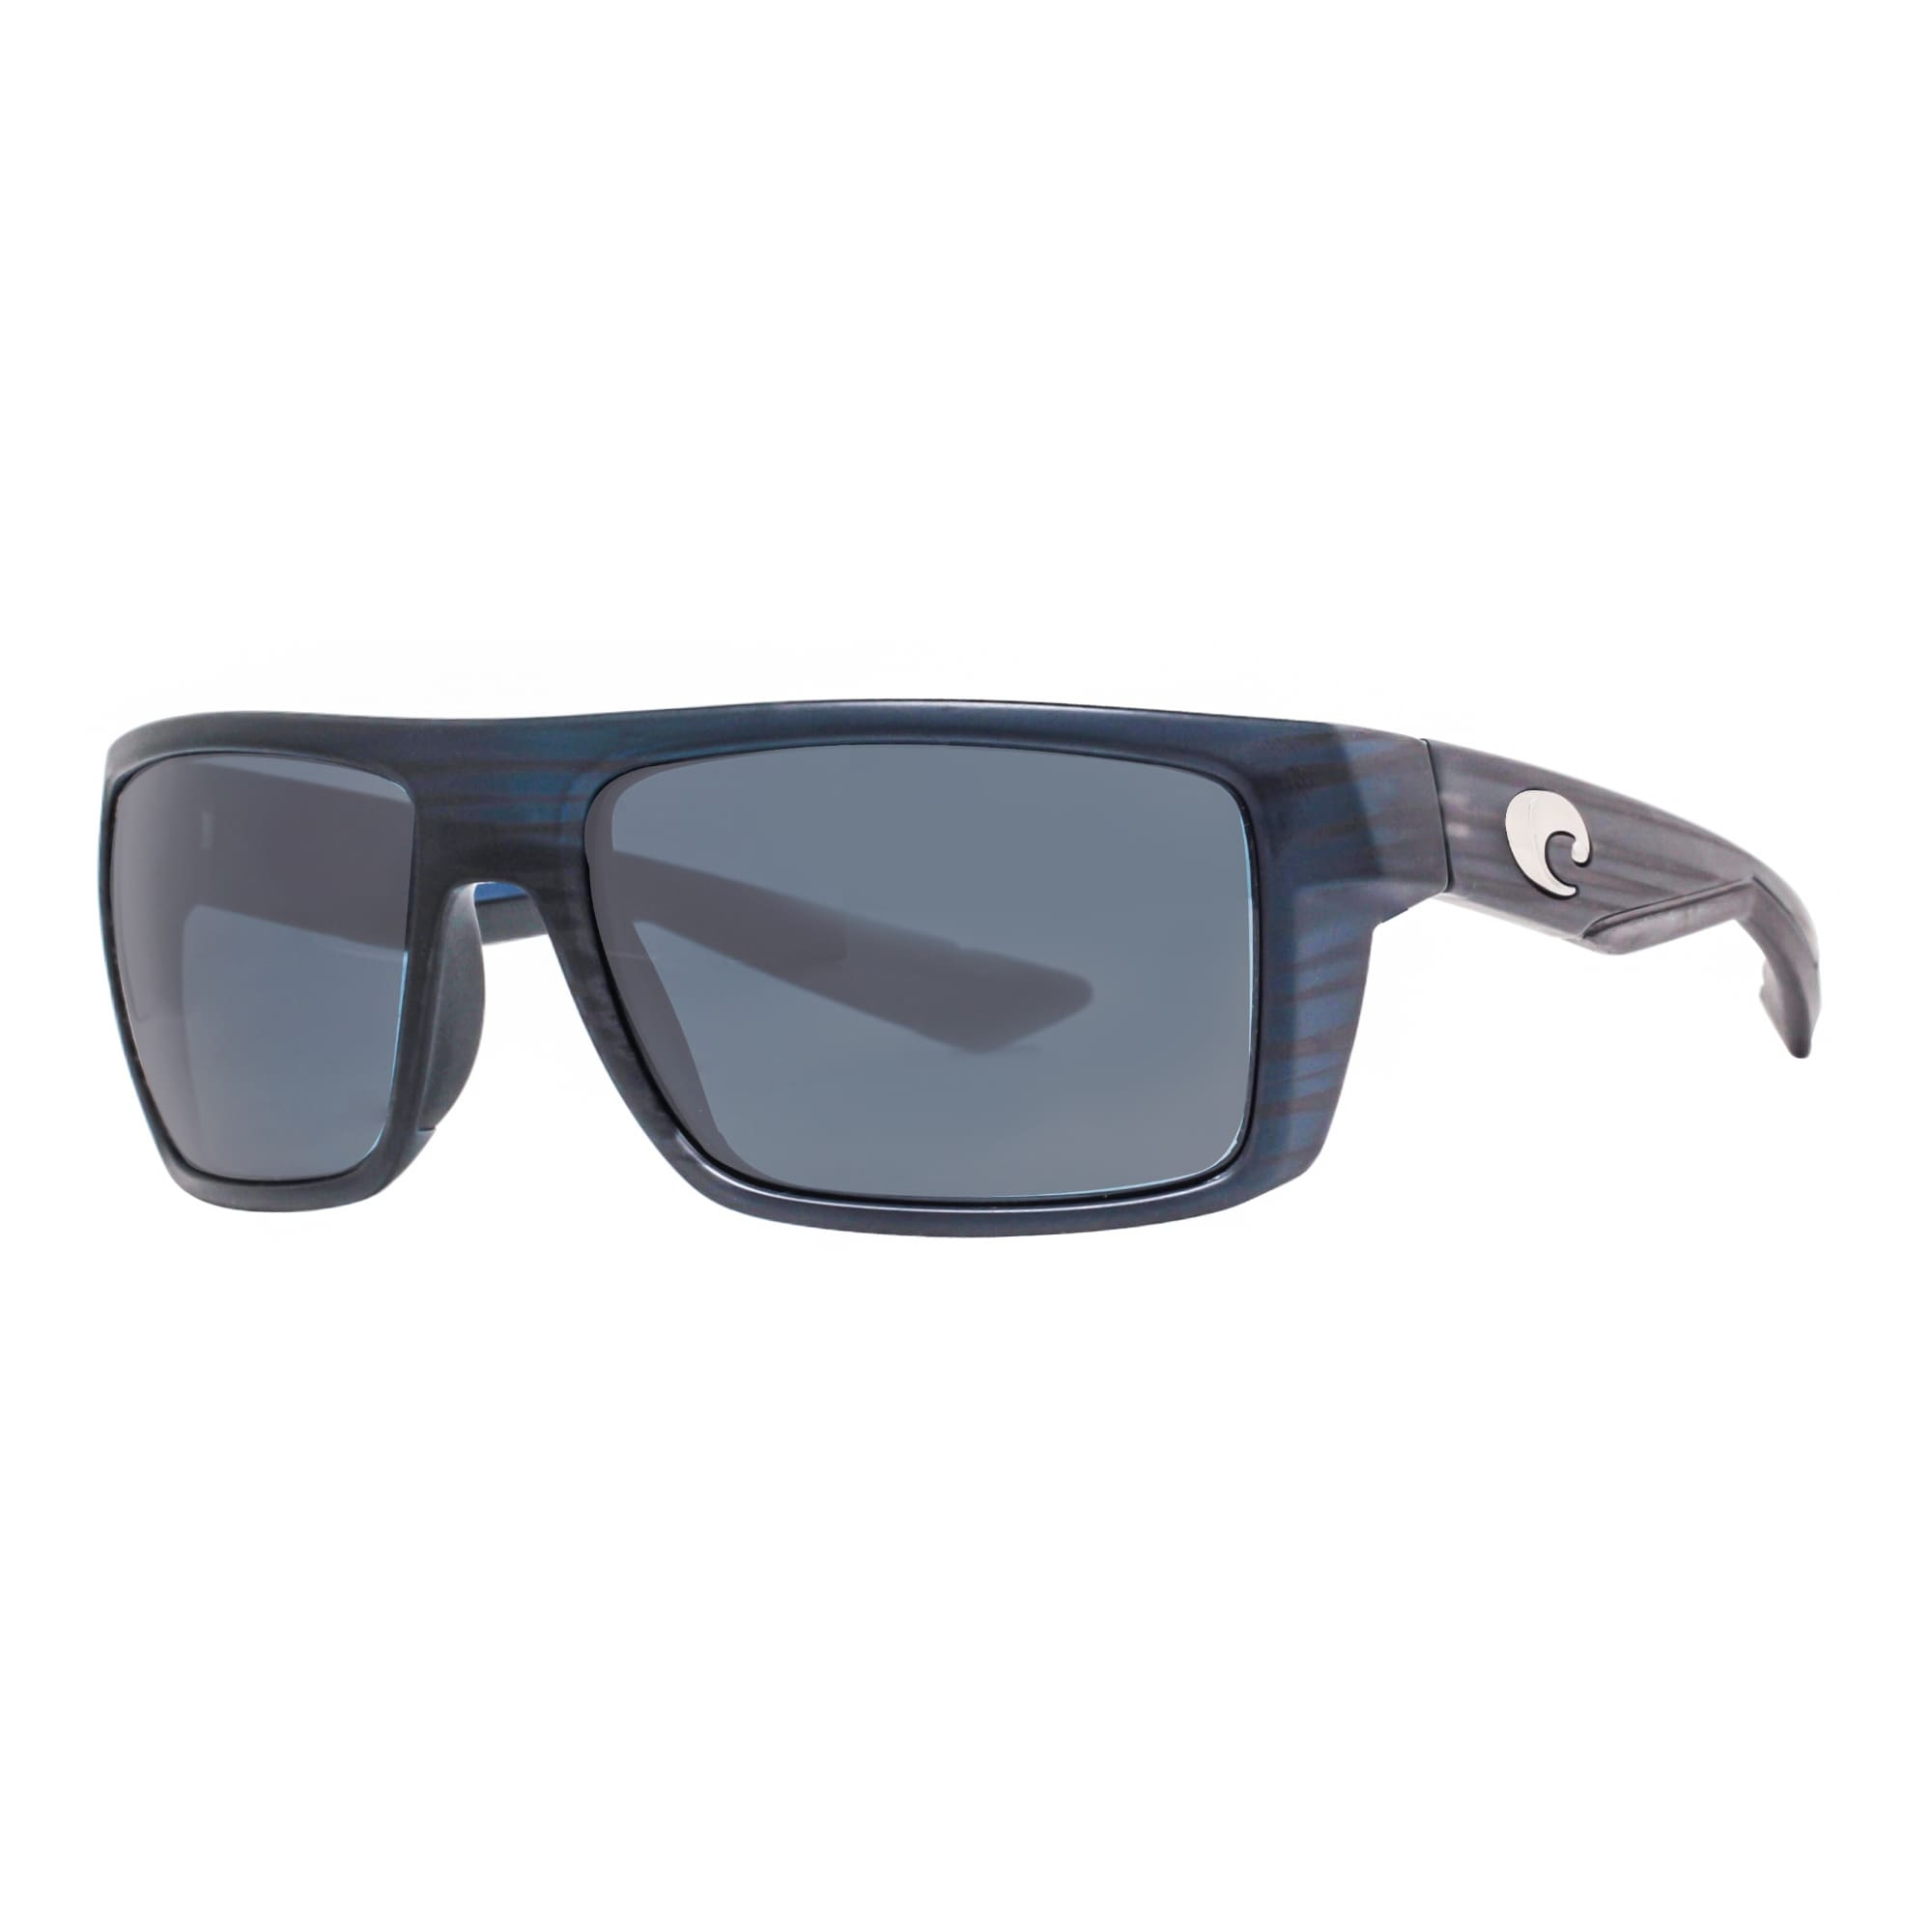 bffbf2b7c0af Costa Del Mar Motu MTU111OGP Matte Black Teak 580P Gray Polarized Sunglasses  - matte black teak - 57mm-18mm-120mm